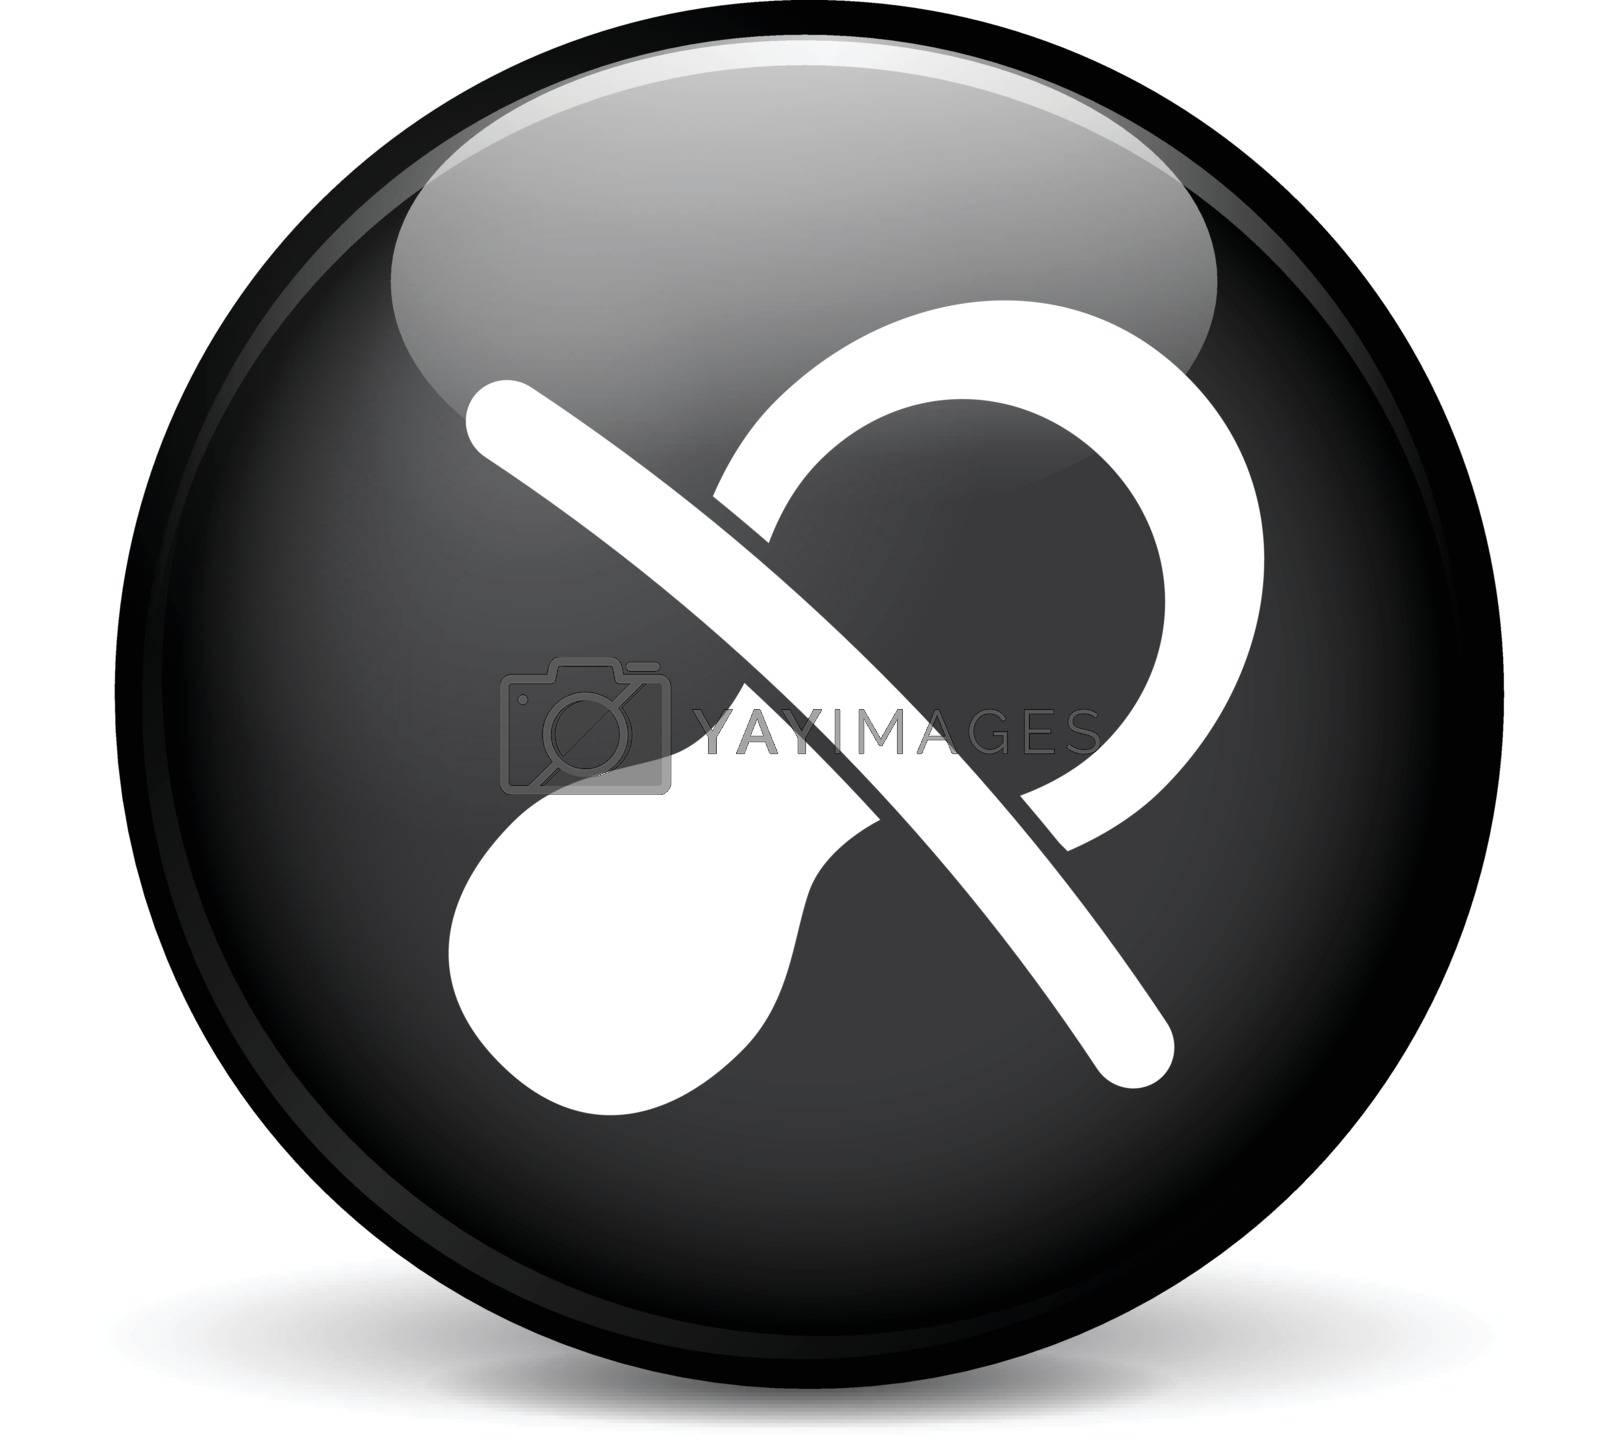 Illustration of baby modern design black sphere icon